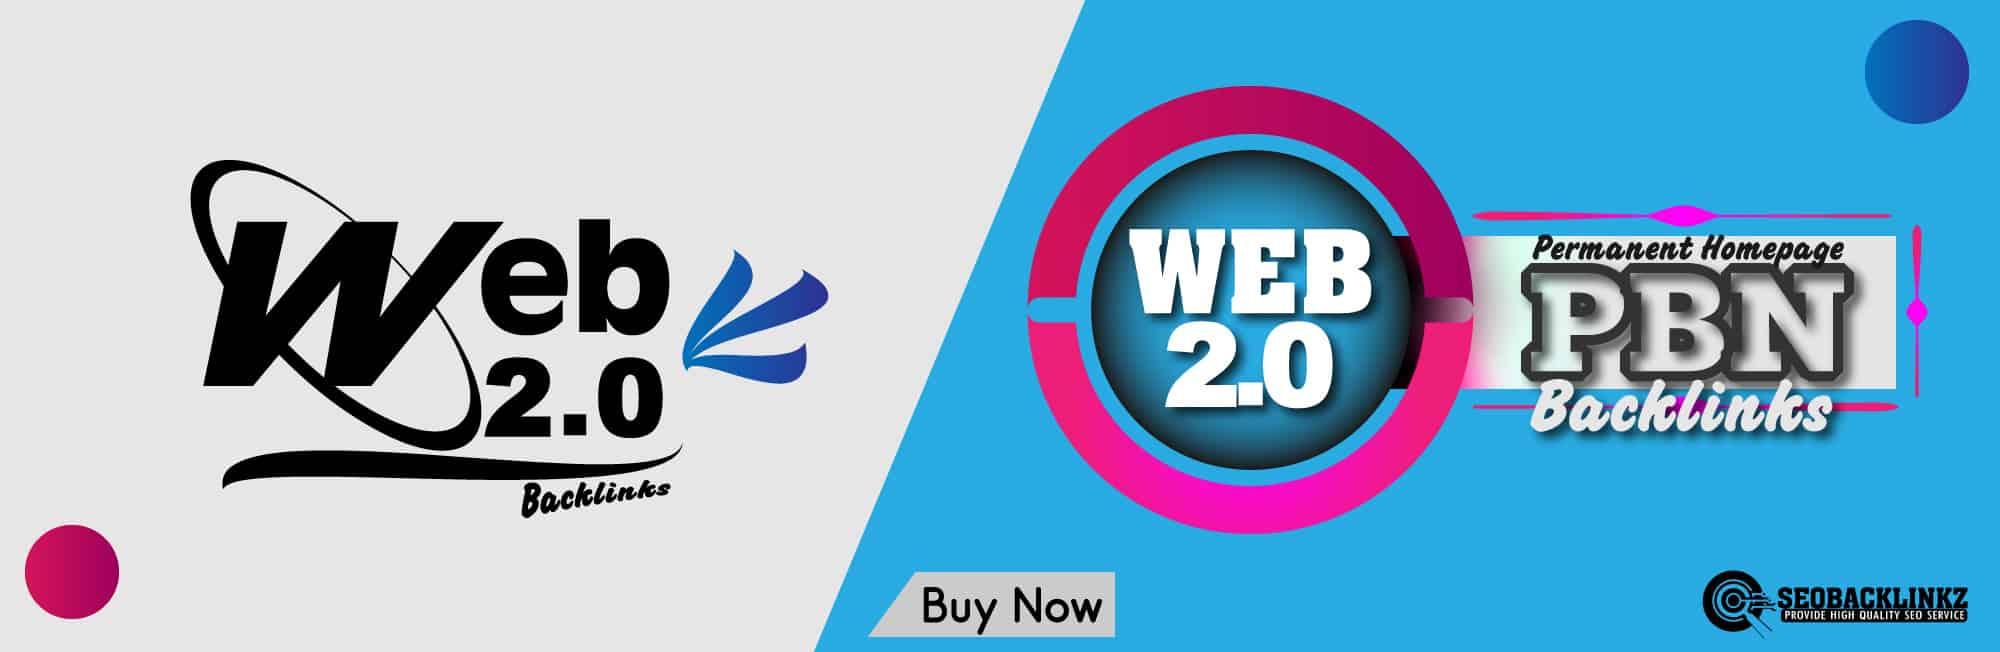 web 2 pbn backlinks